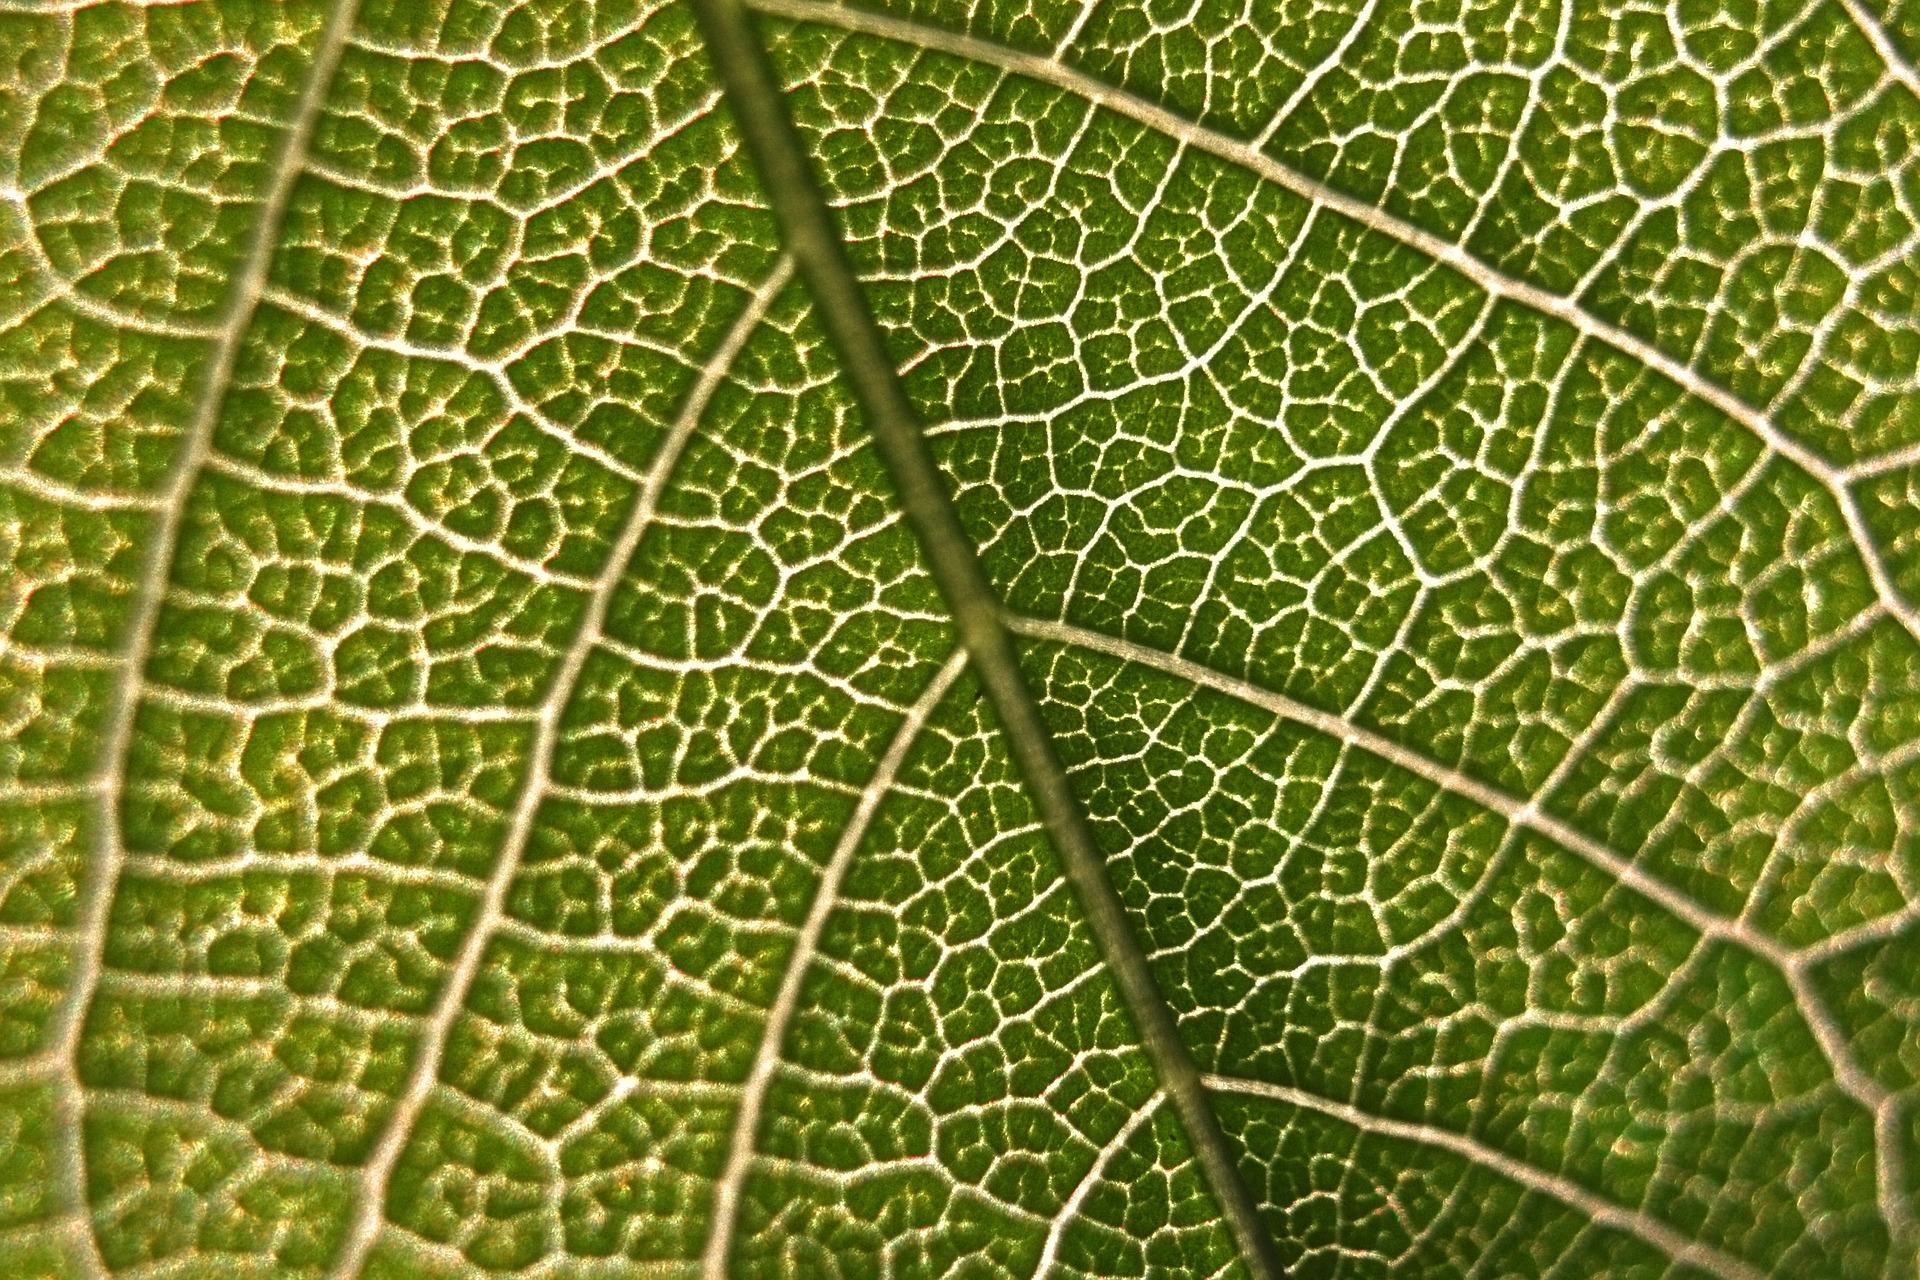 """ Leaf, macro, micro, green, nature "" by  Vadim Gromov  is  Public Domain ."